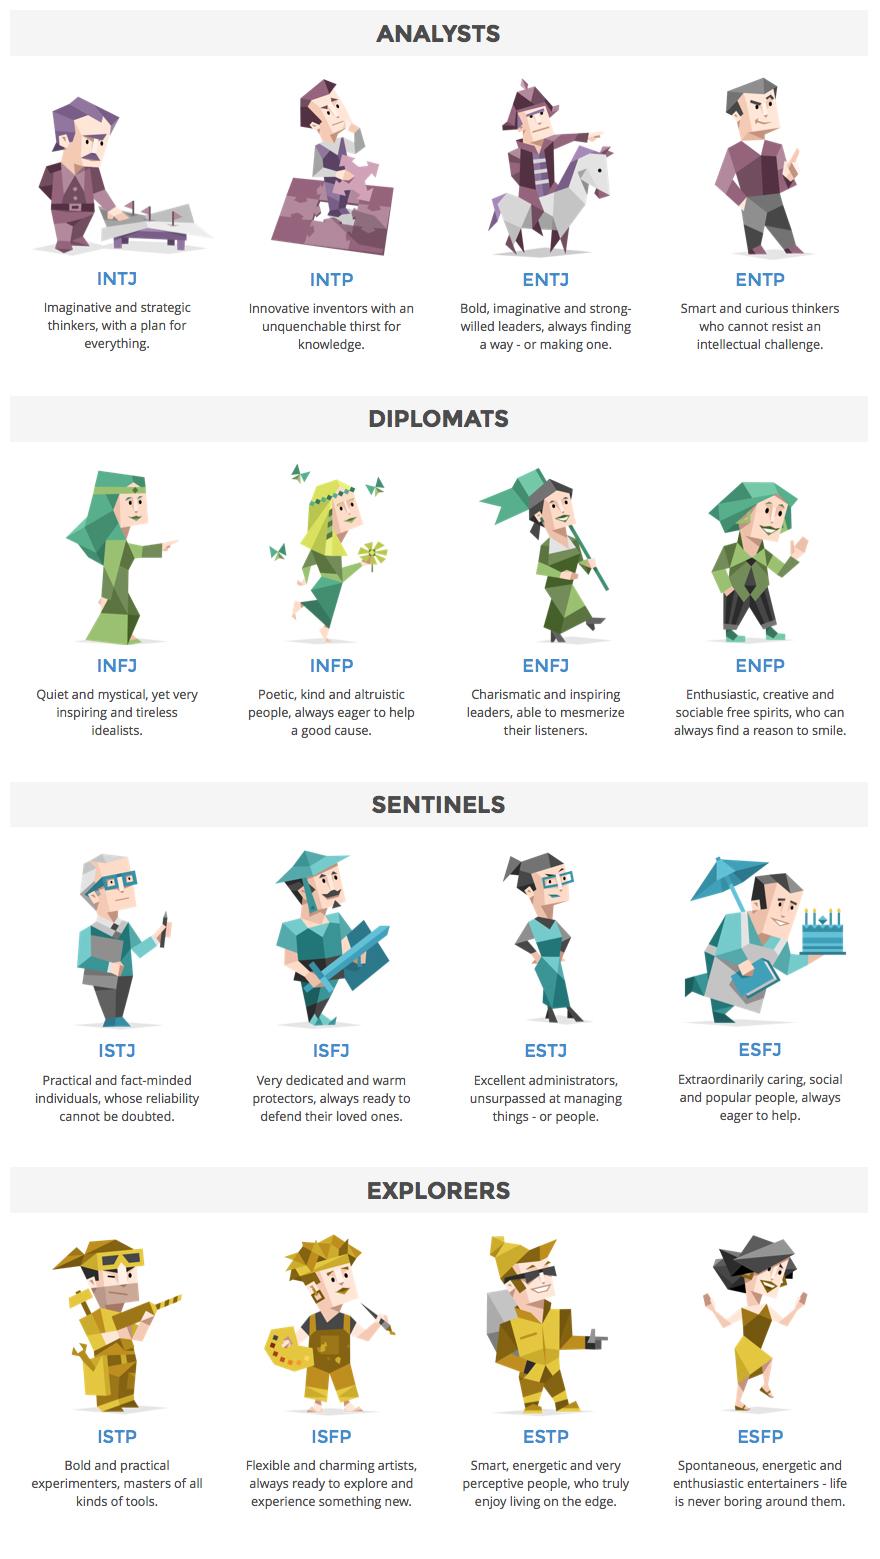 16 personalities meyers brigg characters